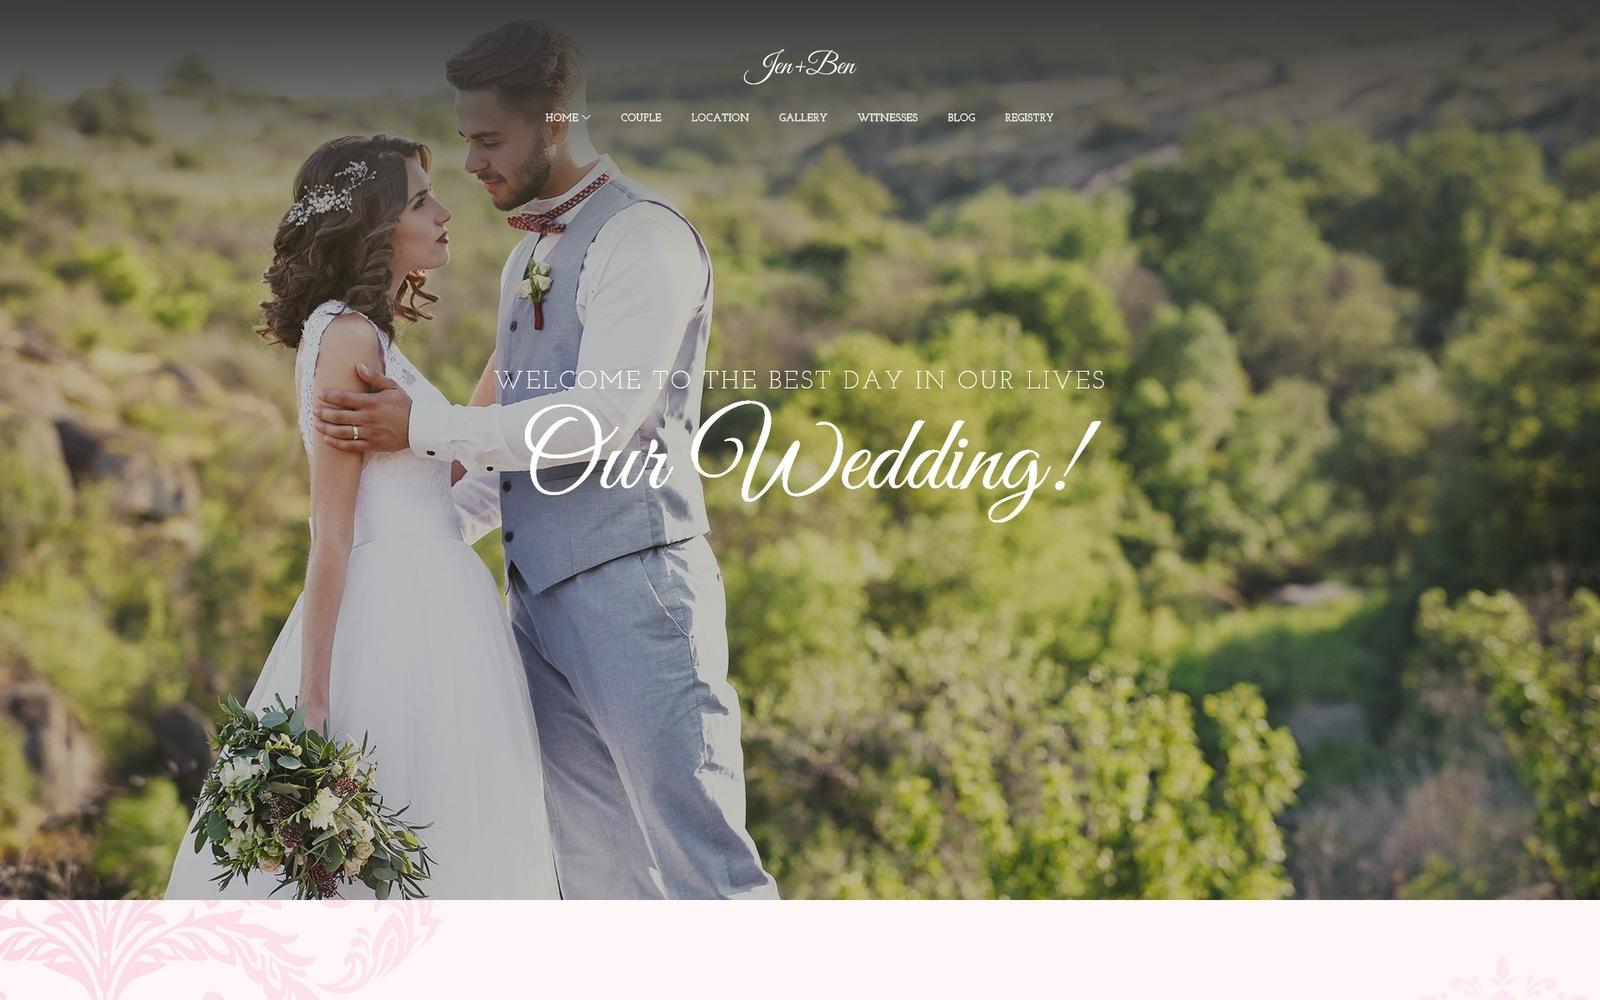 """Jen+Ben - One Page Wedding"" - адаптивний WordPress шаблон №63832"